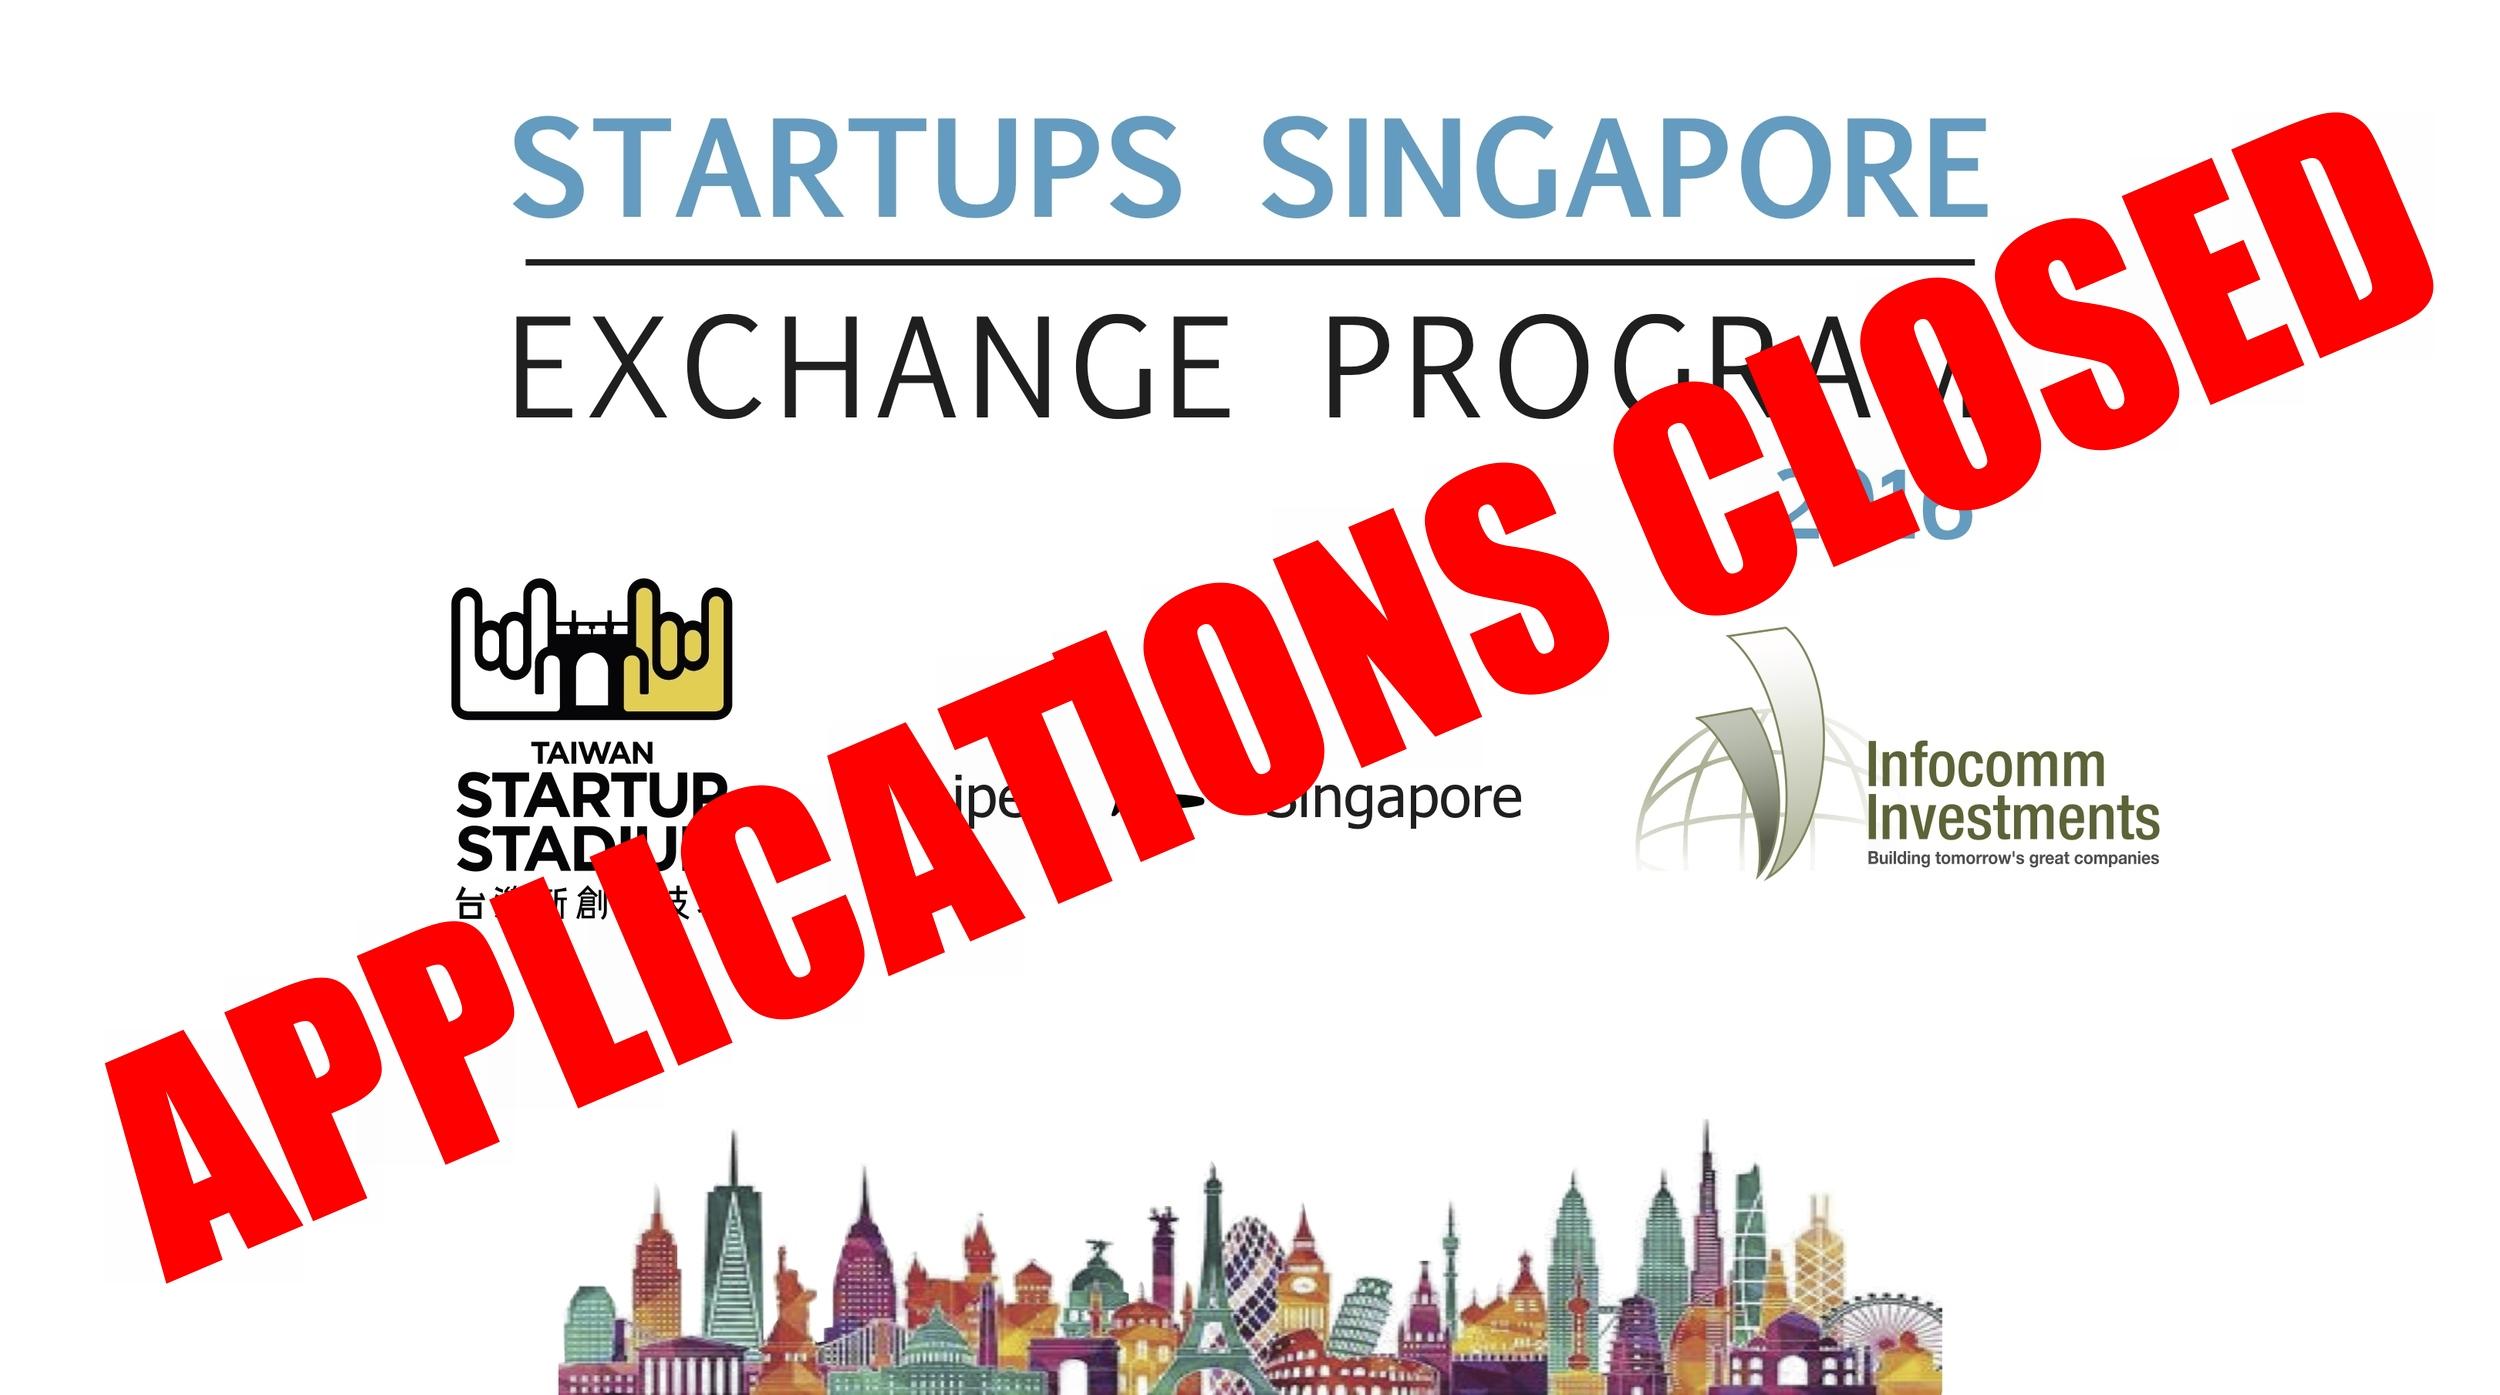 taiwan-startup-stadium-singapore-exchange-infocomm-investments.jpg